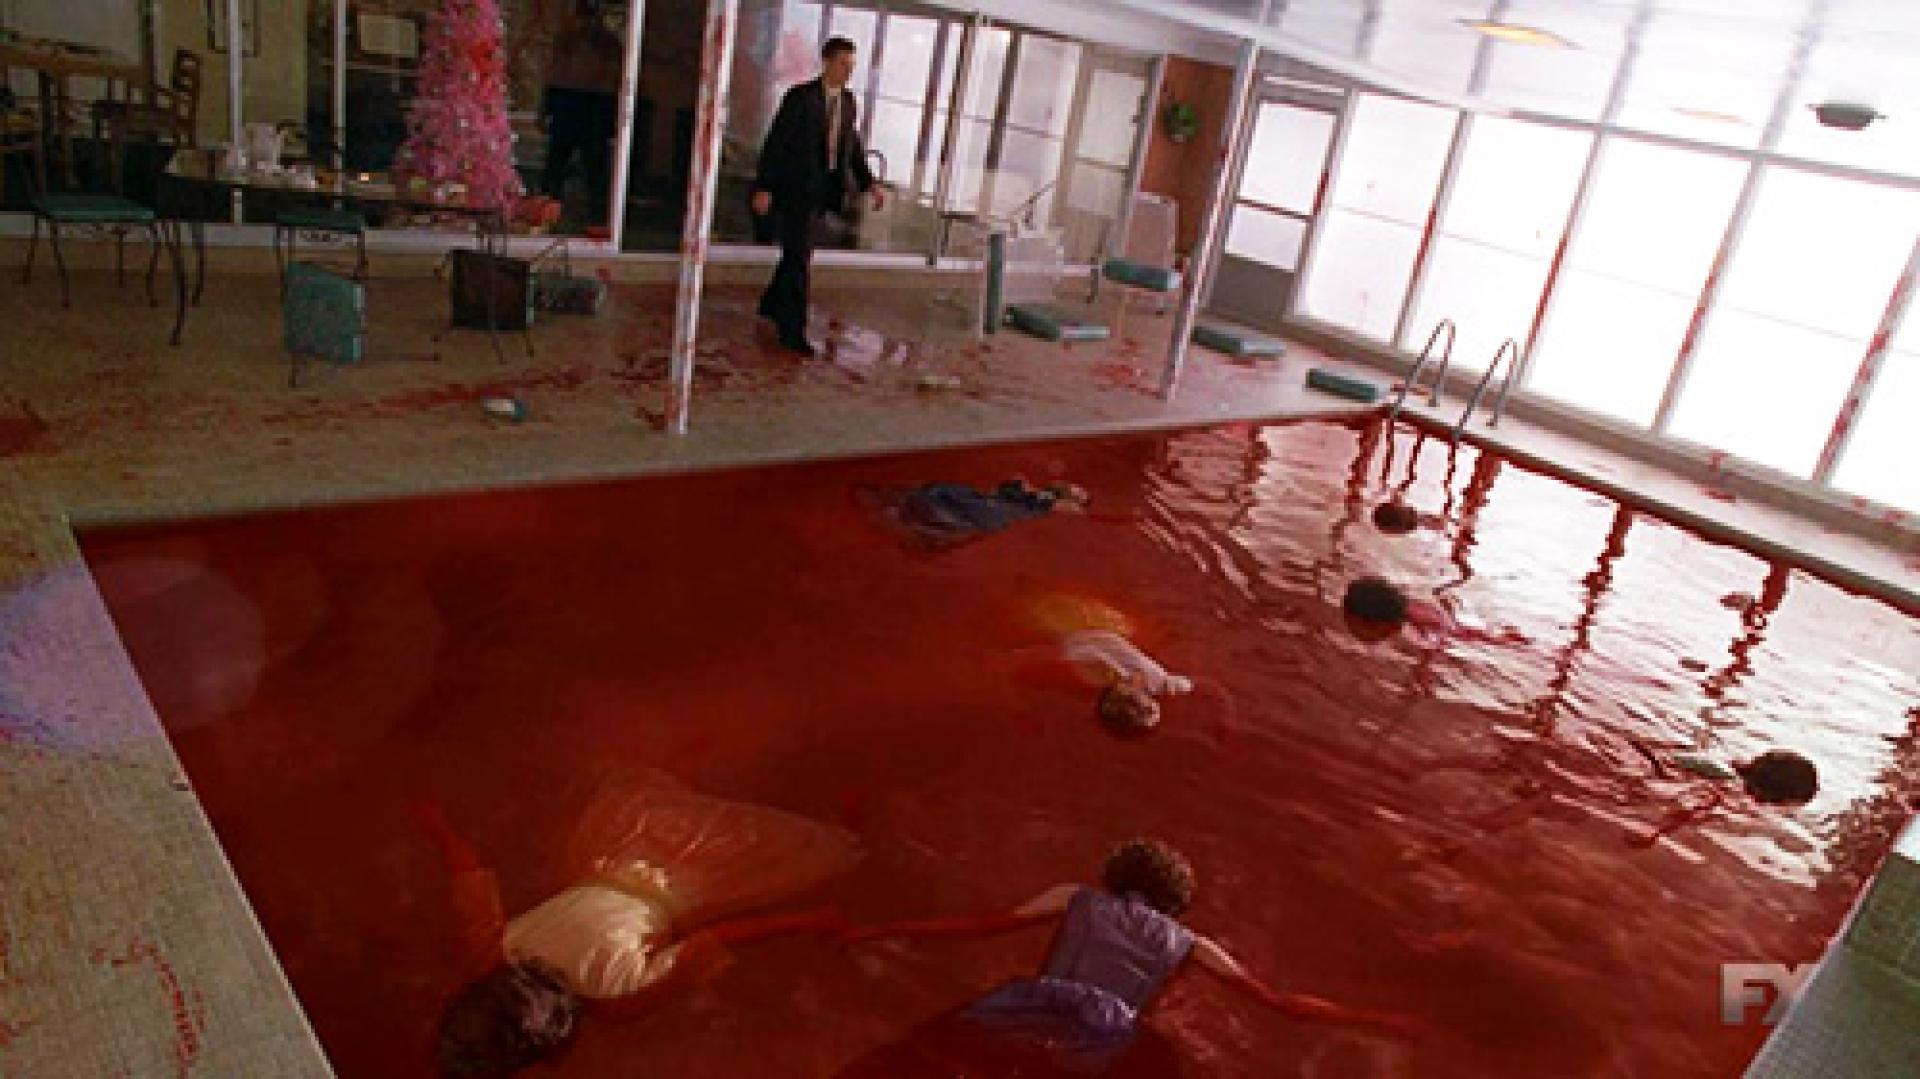 American Horror Story: Freak Show - 4x08-09